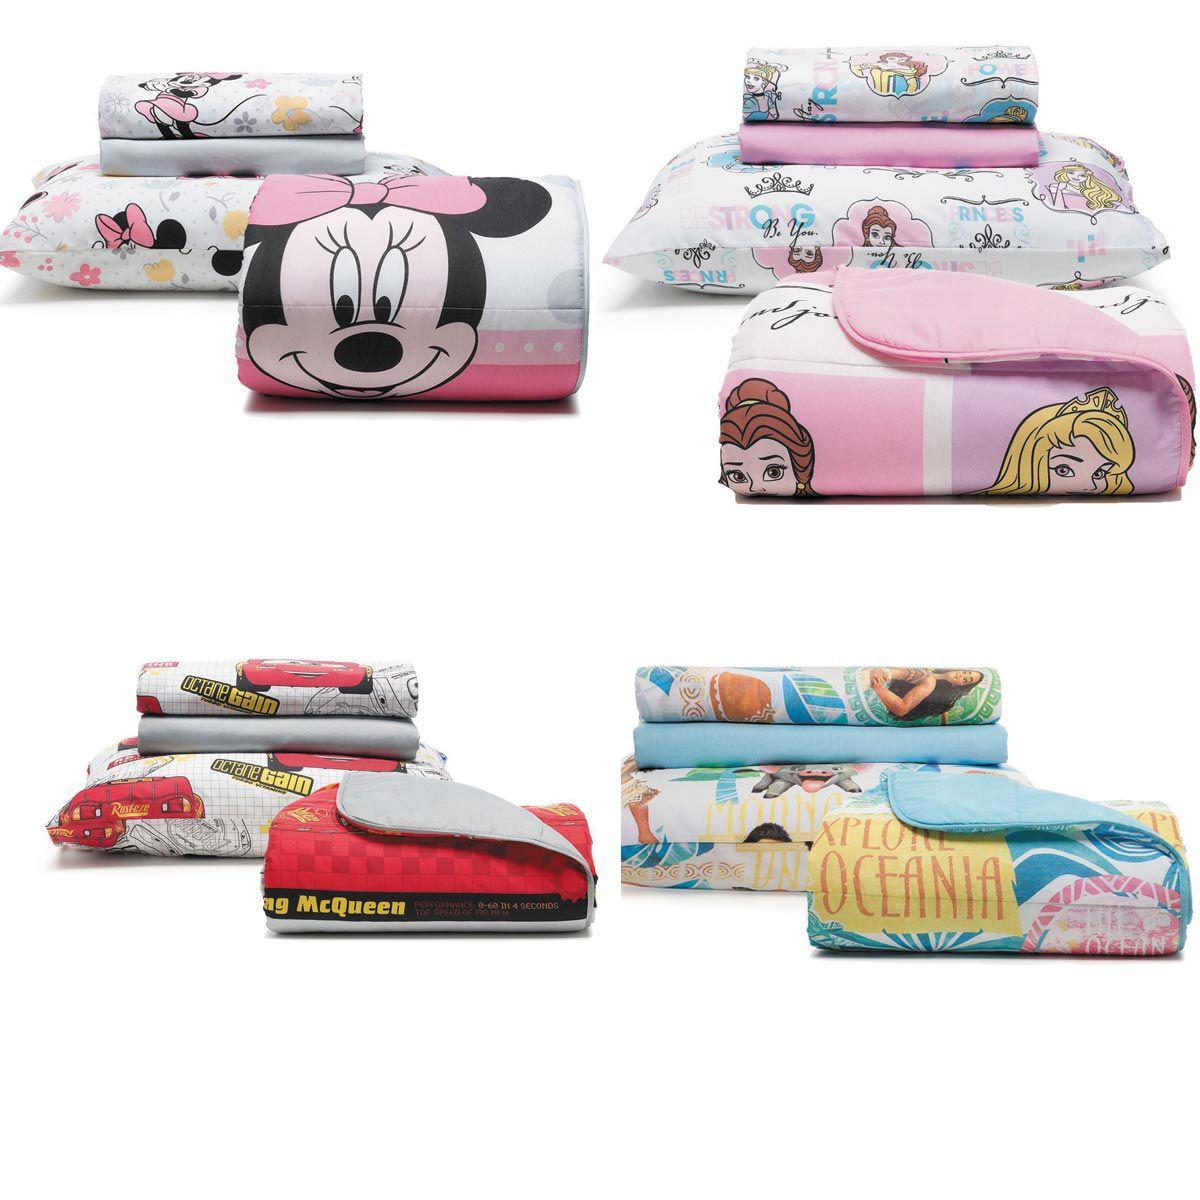 Kit Infantil Disney Menino E Menina Edredom + Jogo Cama Santista